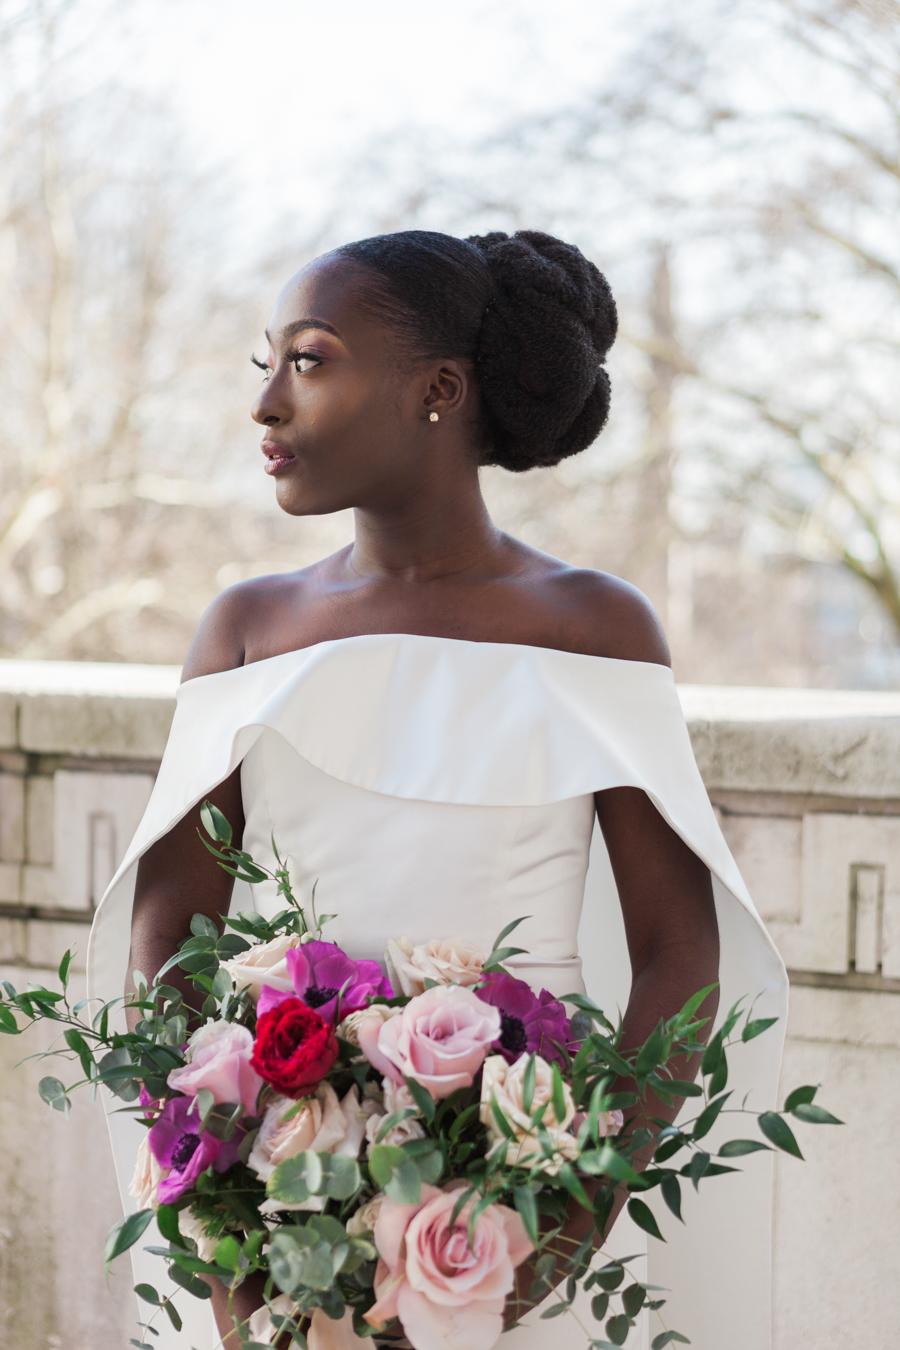 Breathtakingly beautiful - diversity wins in this stunning RSA London wedding editorial! (25)